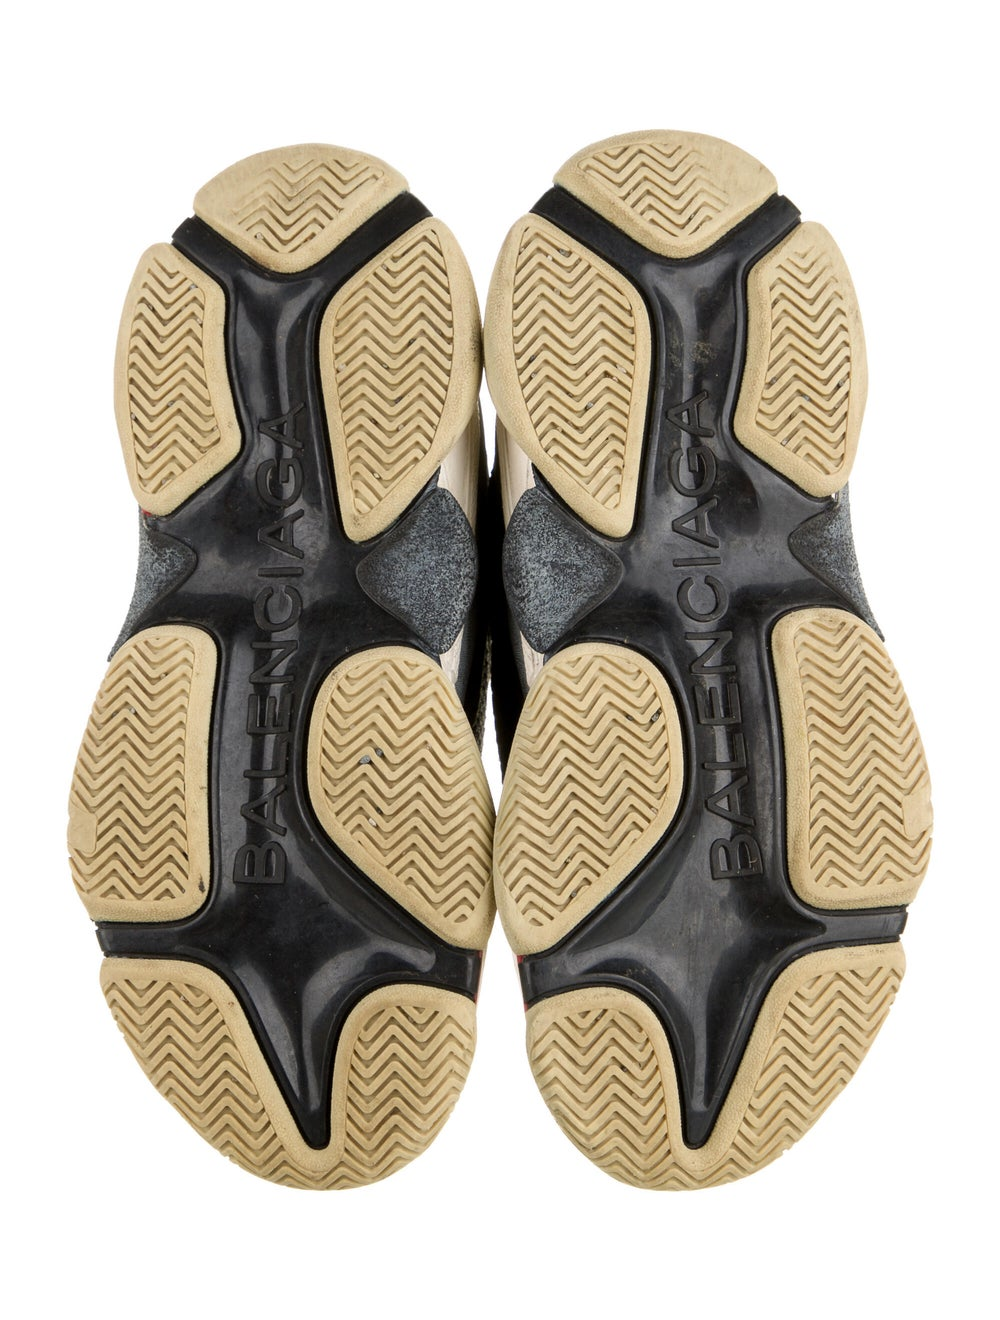 Balenciaga Triple S Chunky Sneakers Black - image 5